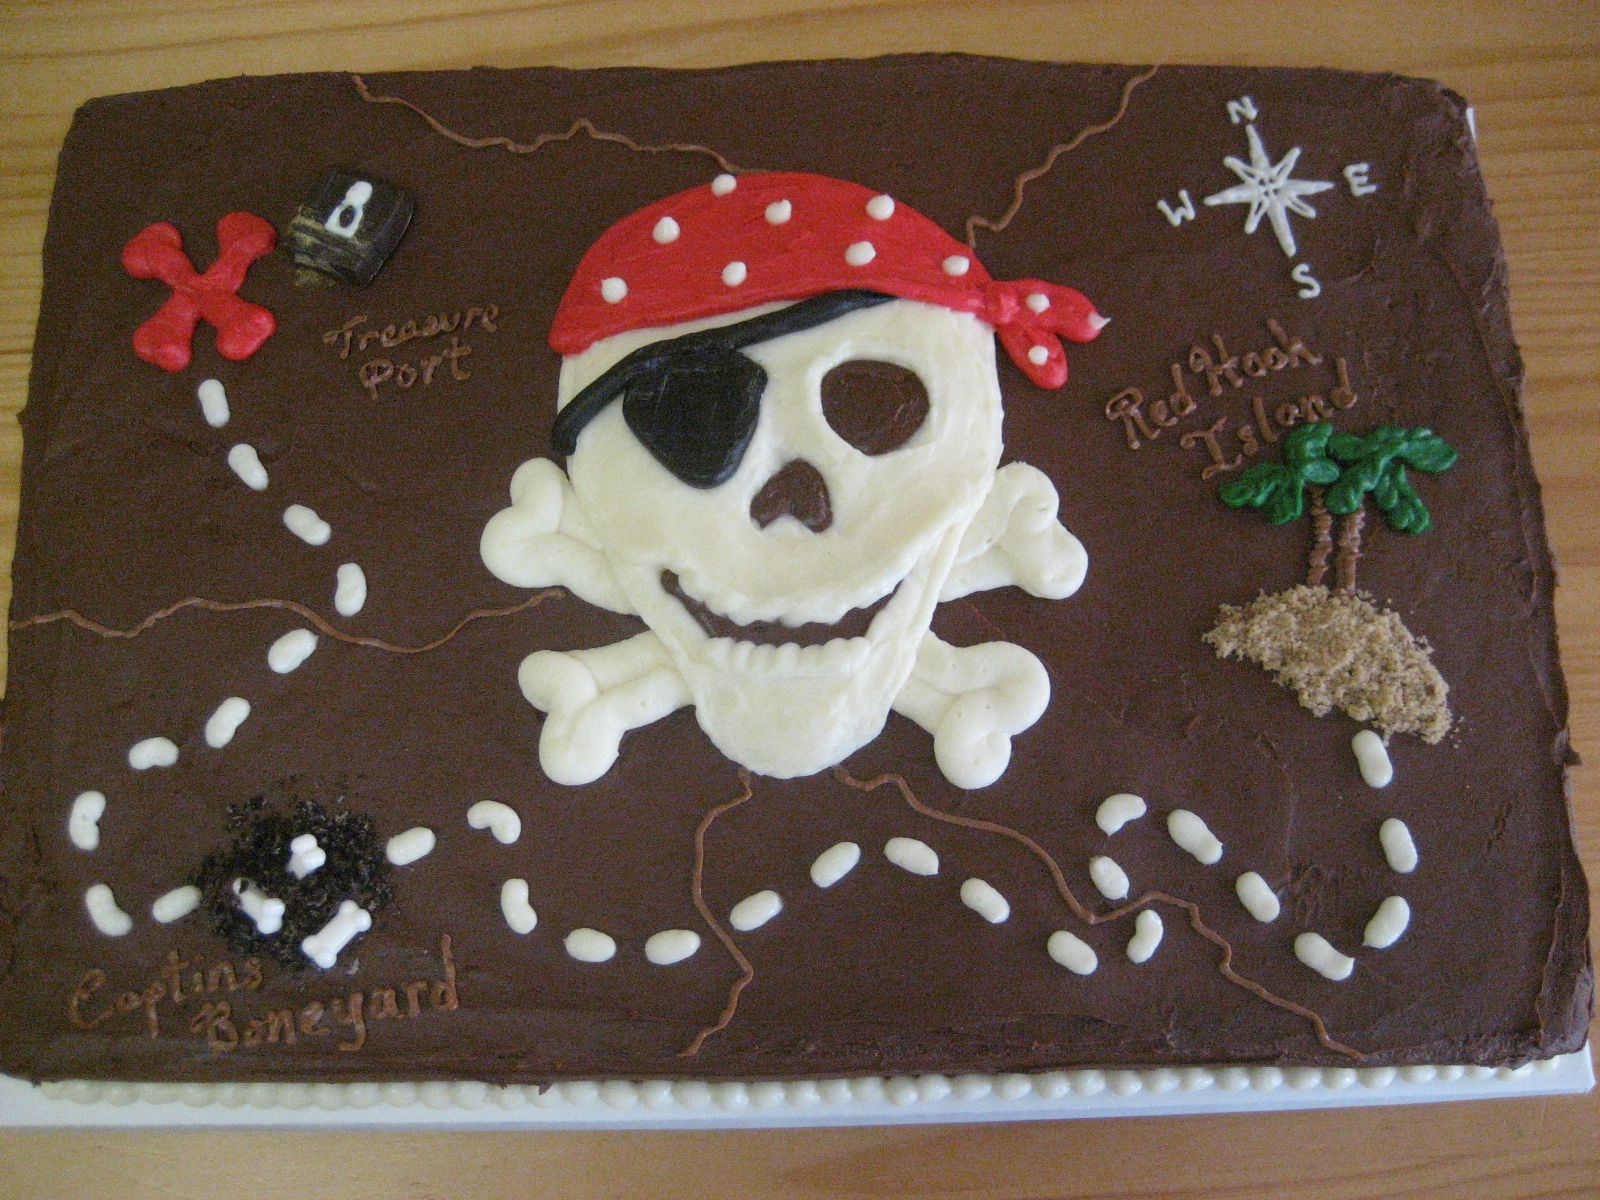 Treasure Map Cakes